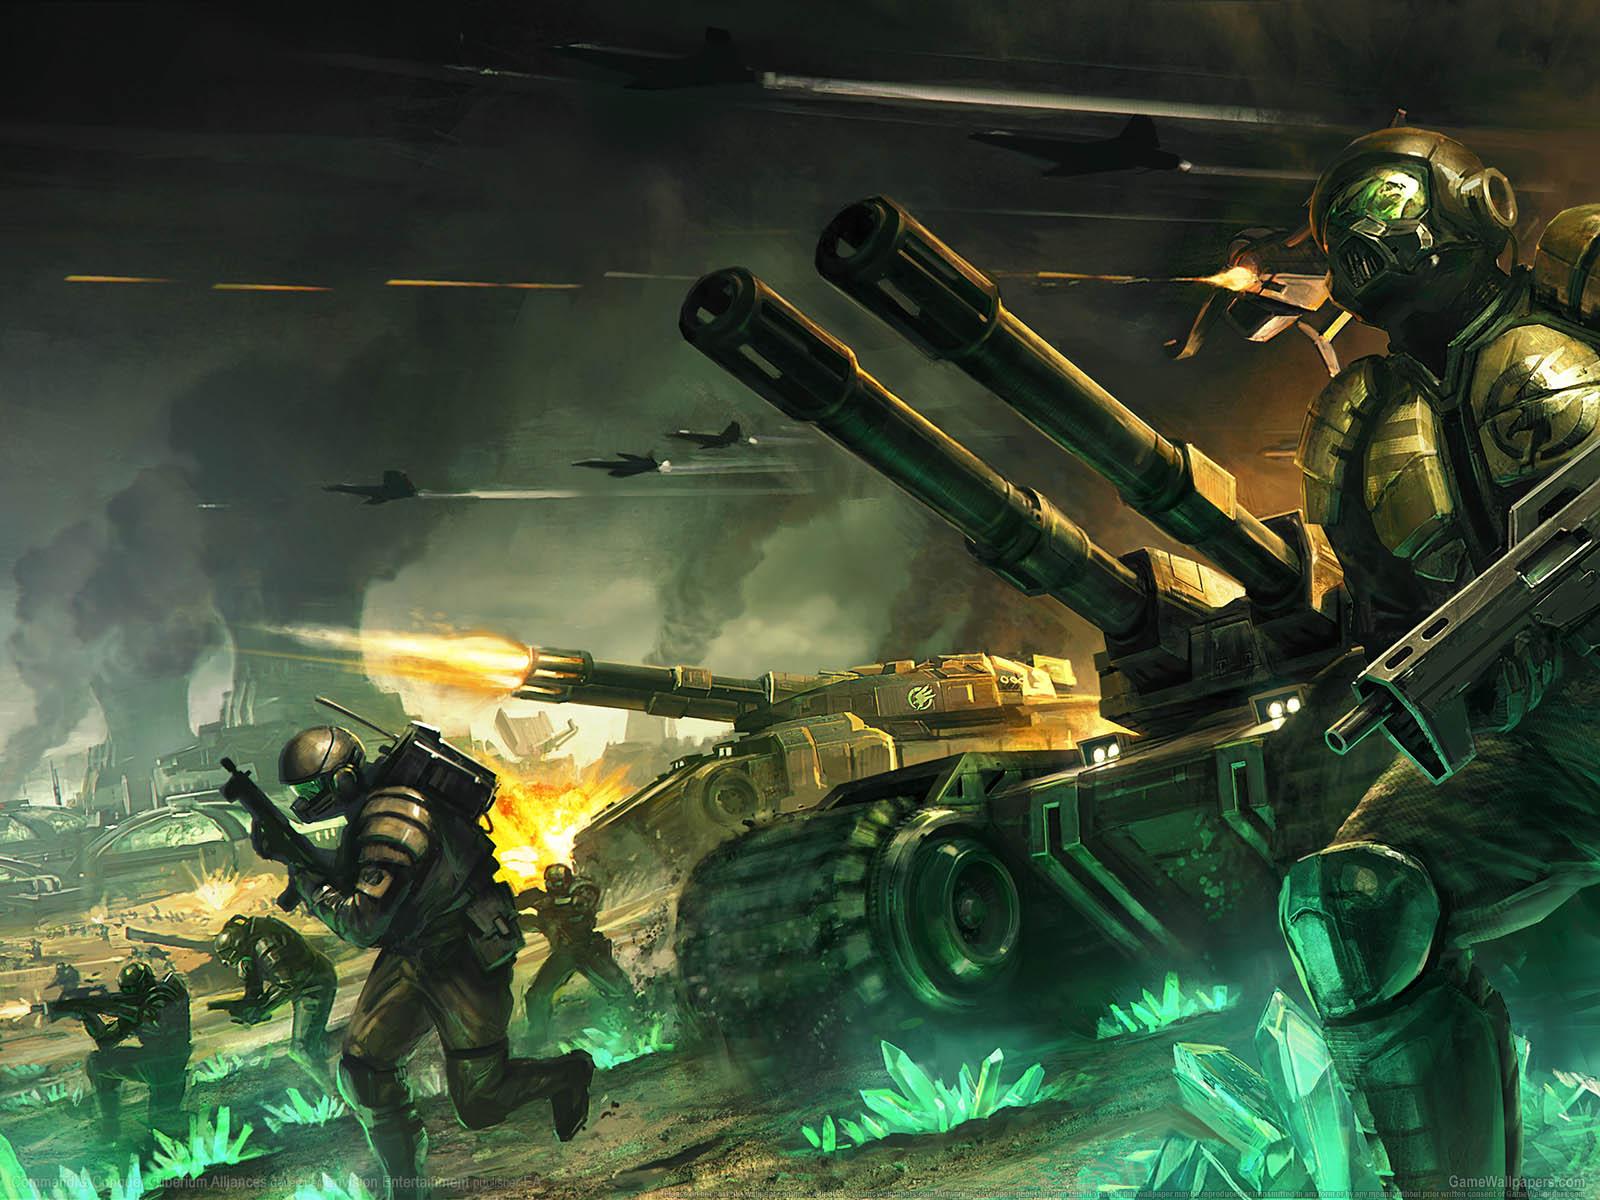 Command & Conquer: Tiberium Alliancesνmmer=01 achtergrond  1600x1200